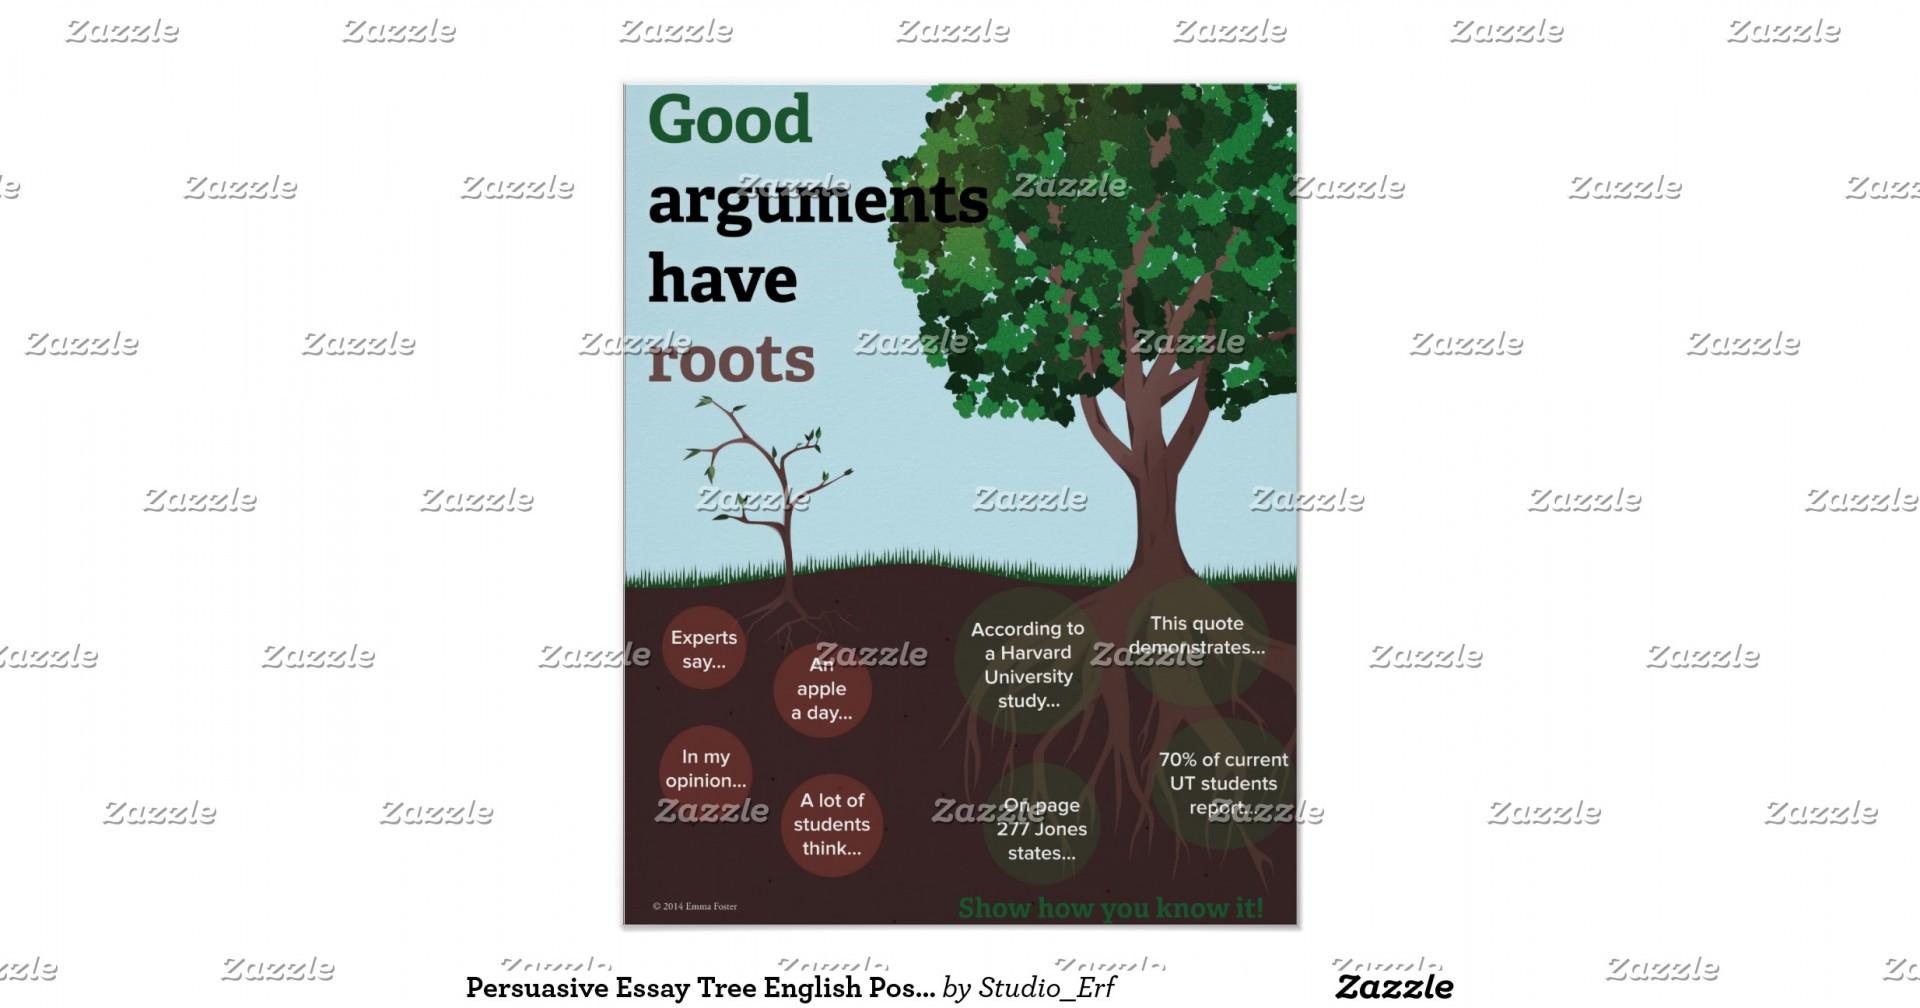 020 Tree Essay Persuasive English Poster R8be3ce2455f34b5d94cdccbff38c0c9f Qoe 8byvr 1200view Padding0 Unforgettable Neem In Sanskrit Kannada Hindi 1920